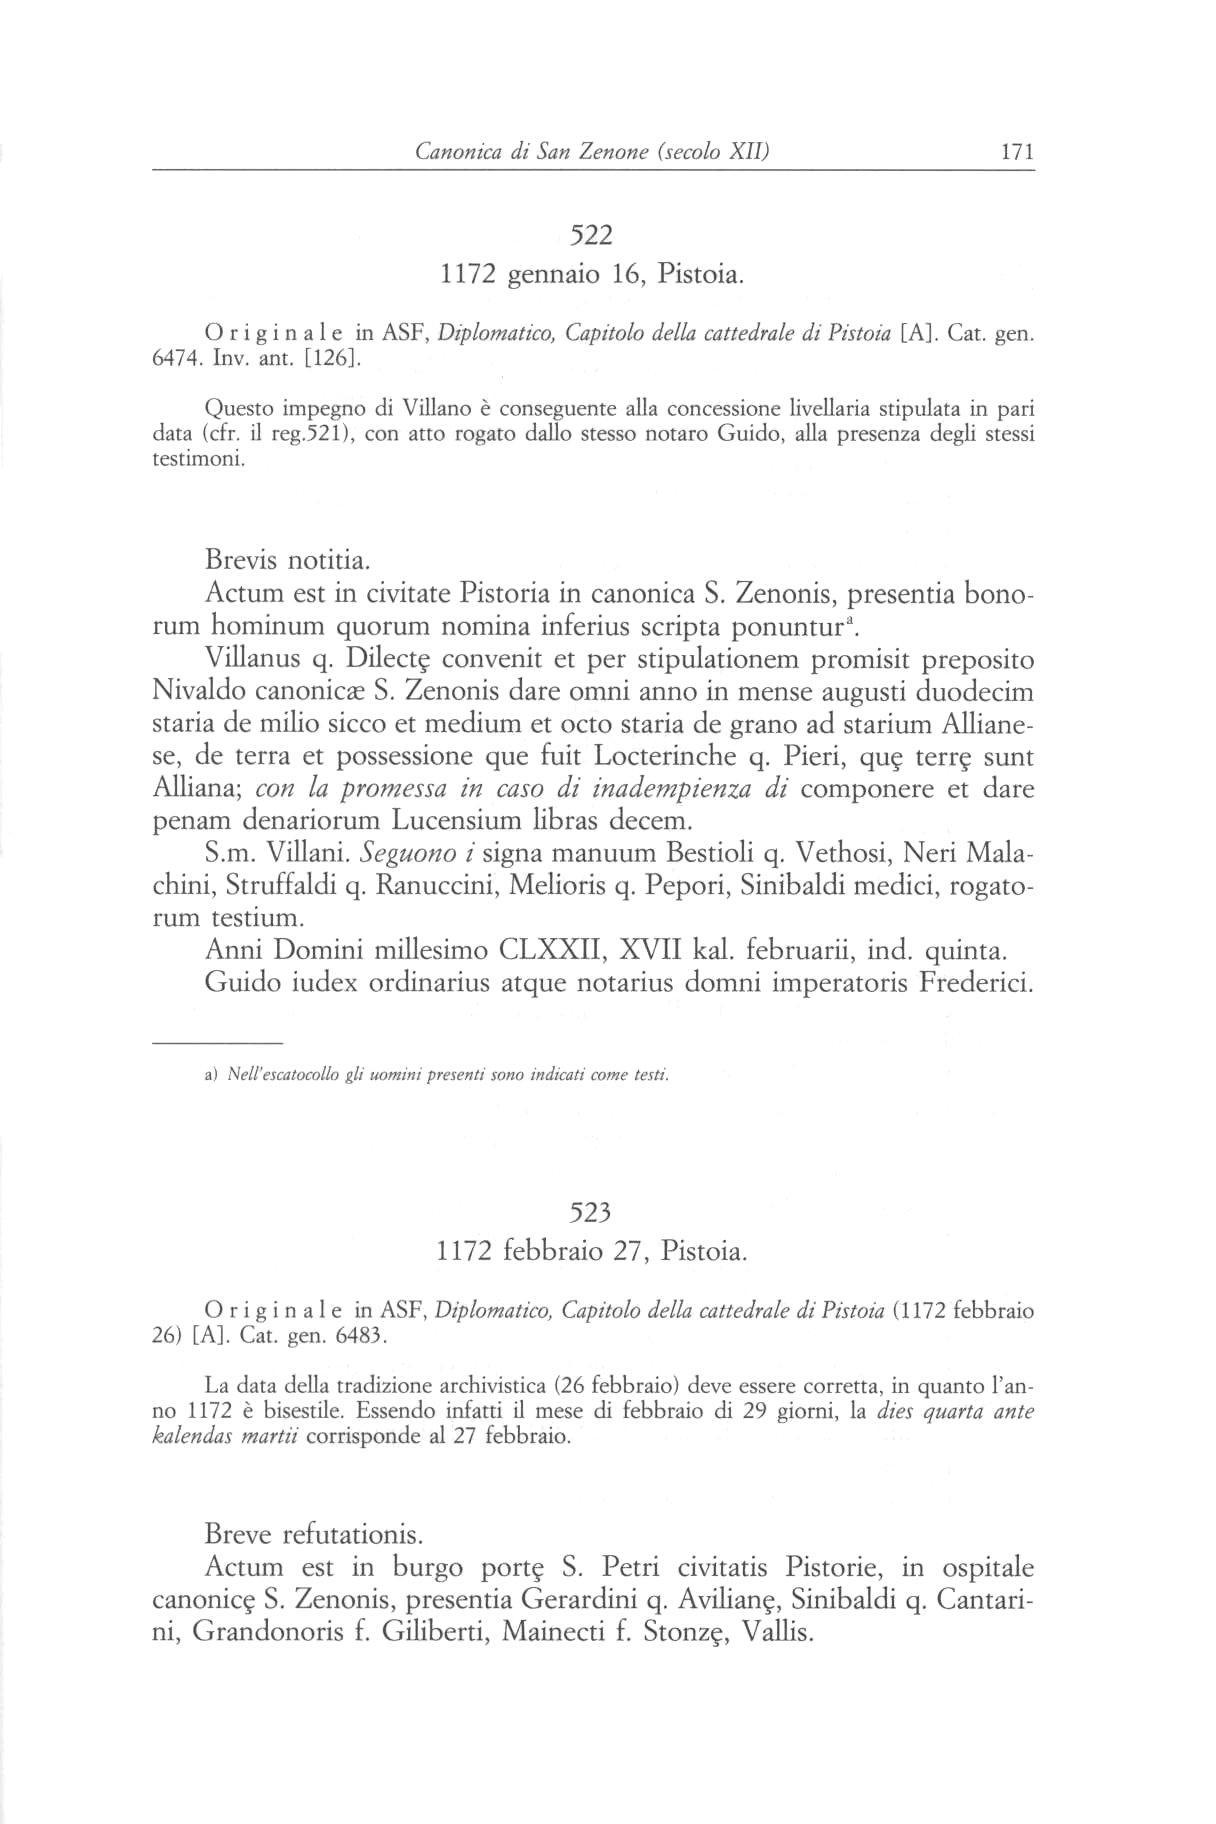 Canonica S. Zenone XII 0171.jpg